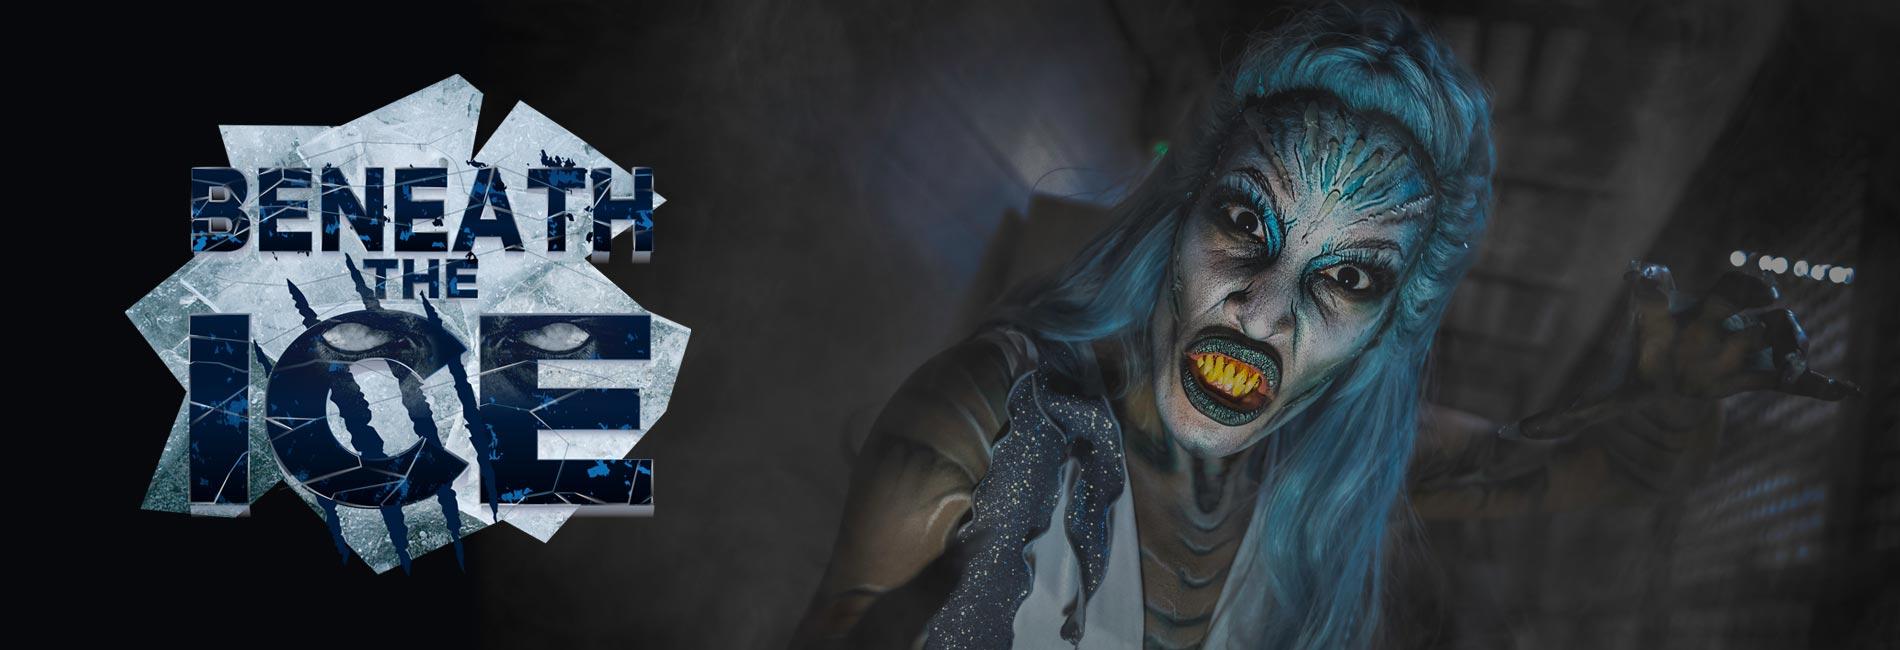 Beneath the Ice Haunted House during Howl-O-Scream at SeaWorld Orlando